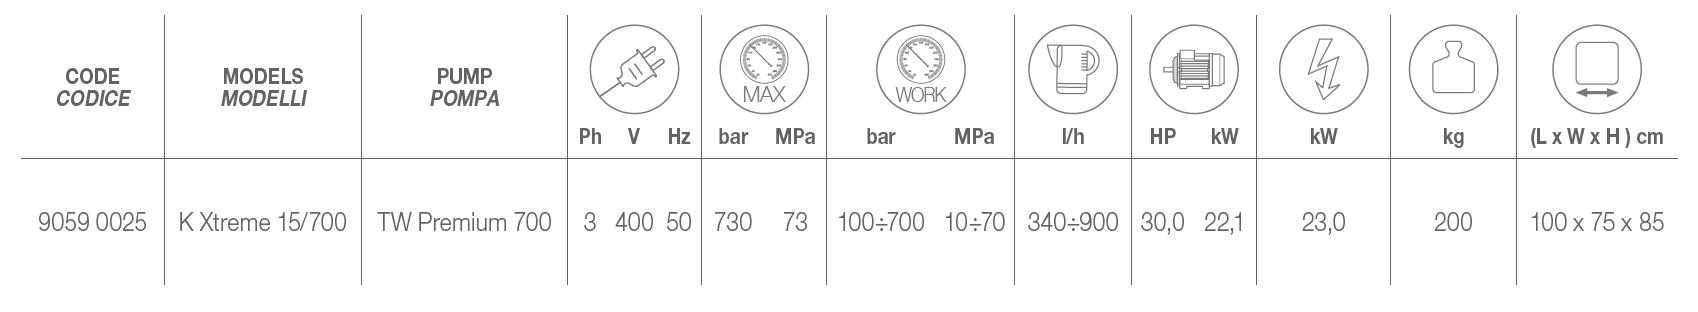 kxtreme700-table